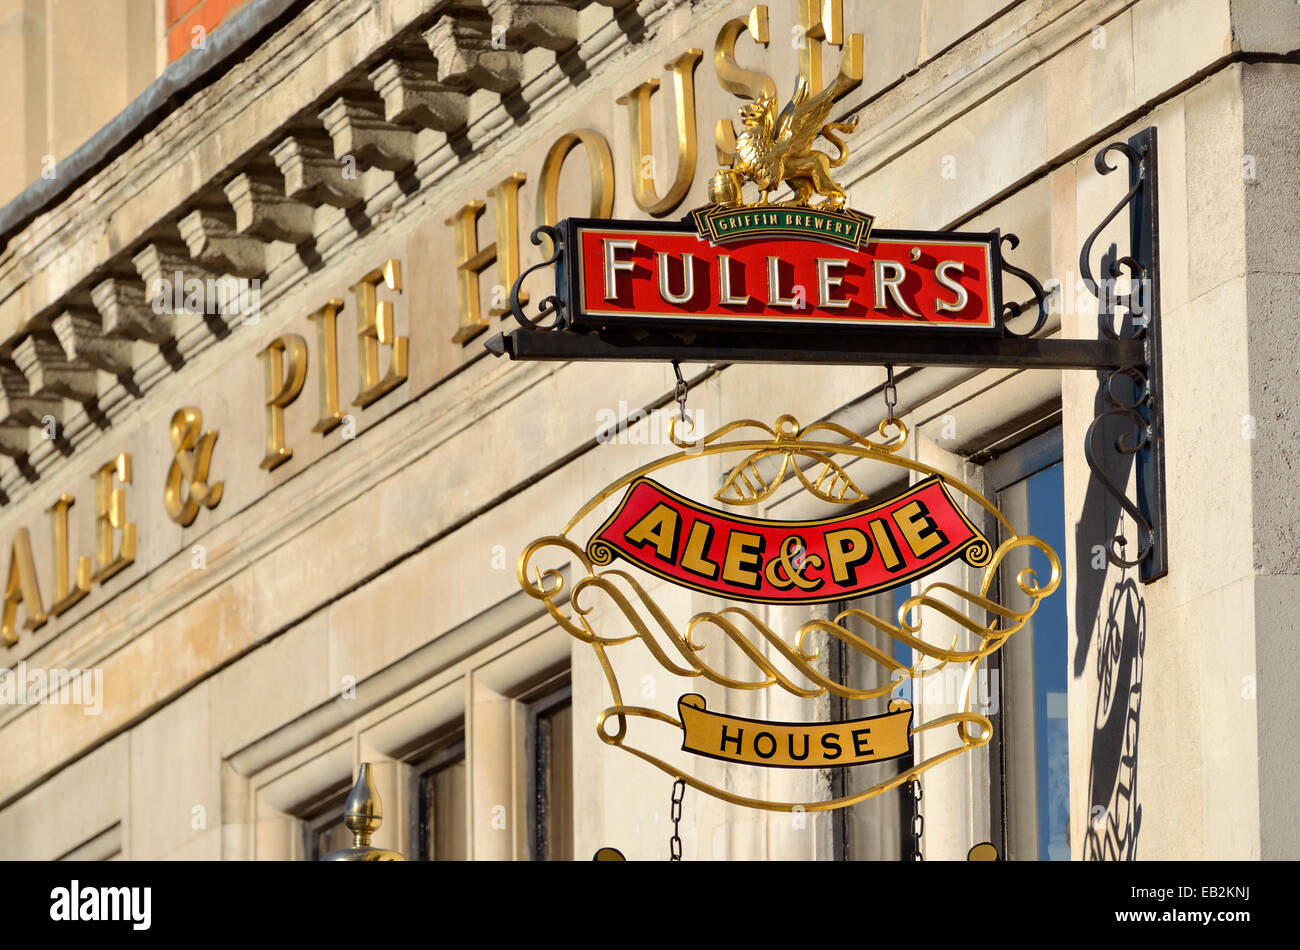 London, England, UK. Fuller's Ale and Pie House, Smithfield - Stock Image